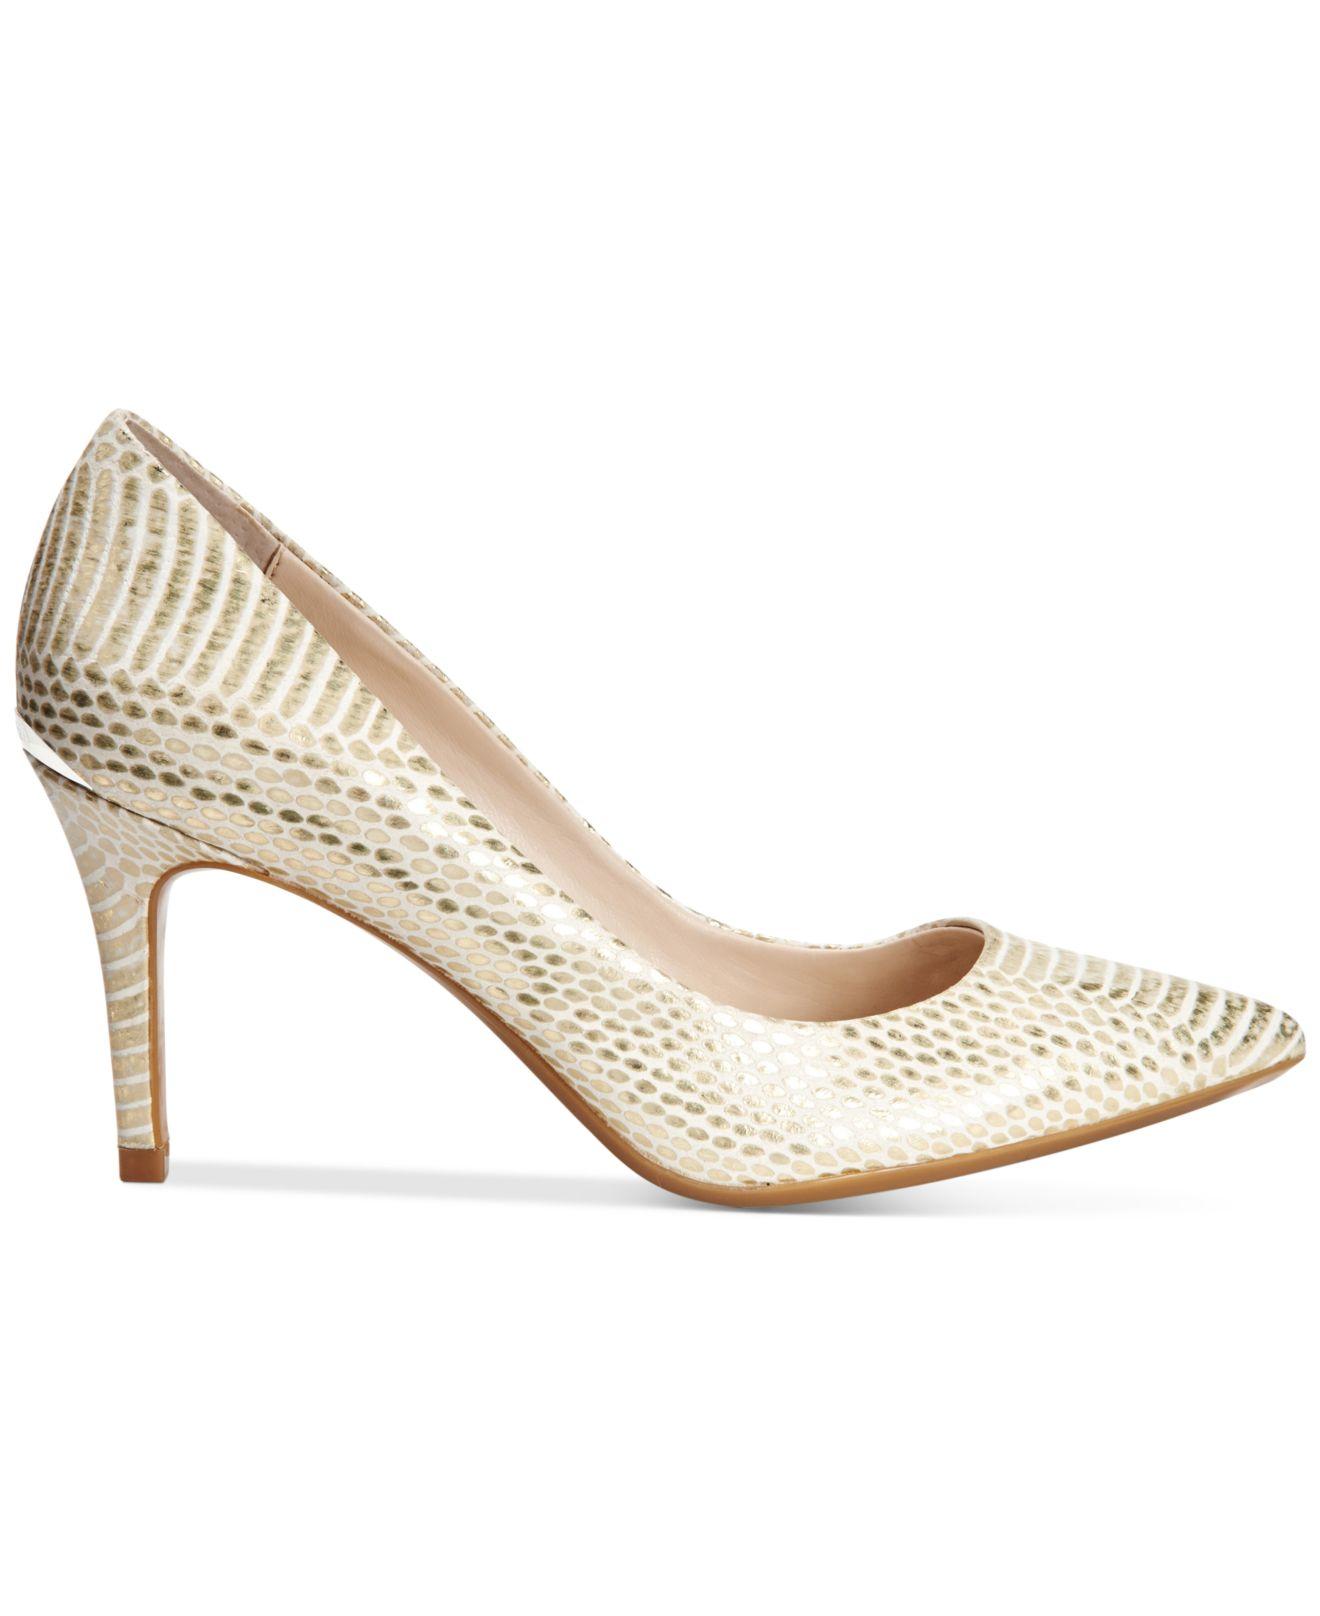 f203763604 Calvin Klein Women's Gayle Pointed-toe Pumps in Metallic - Lyst